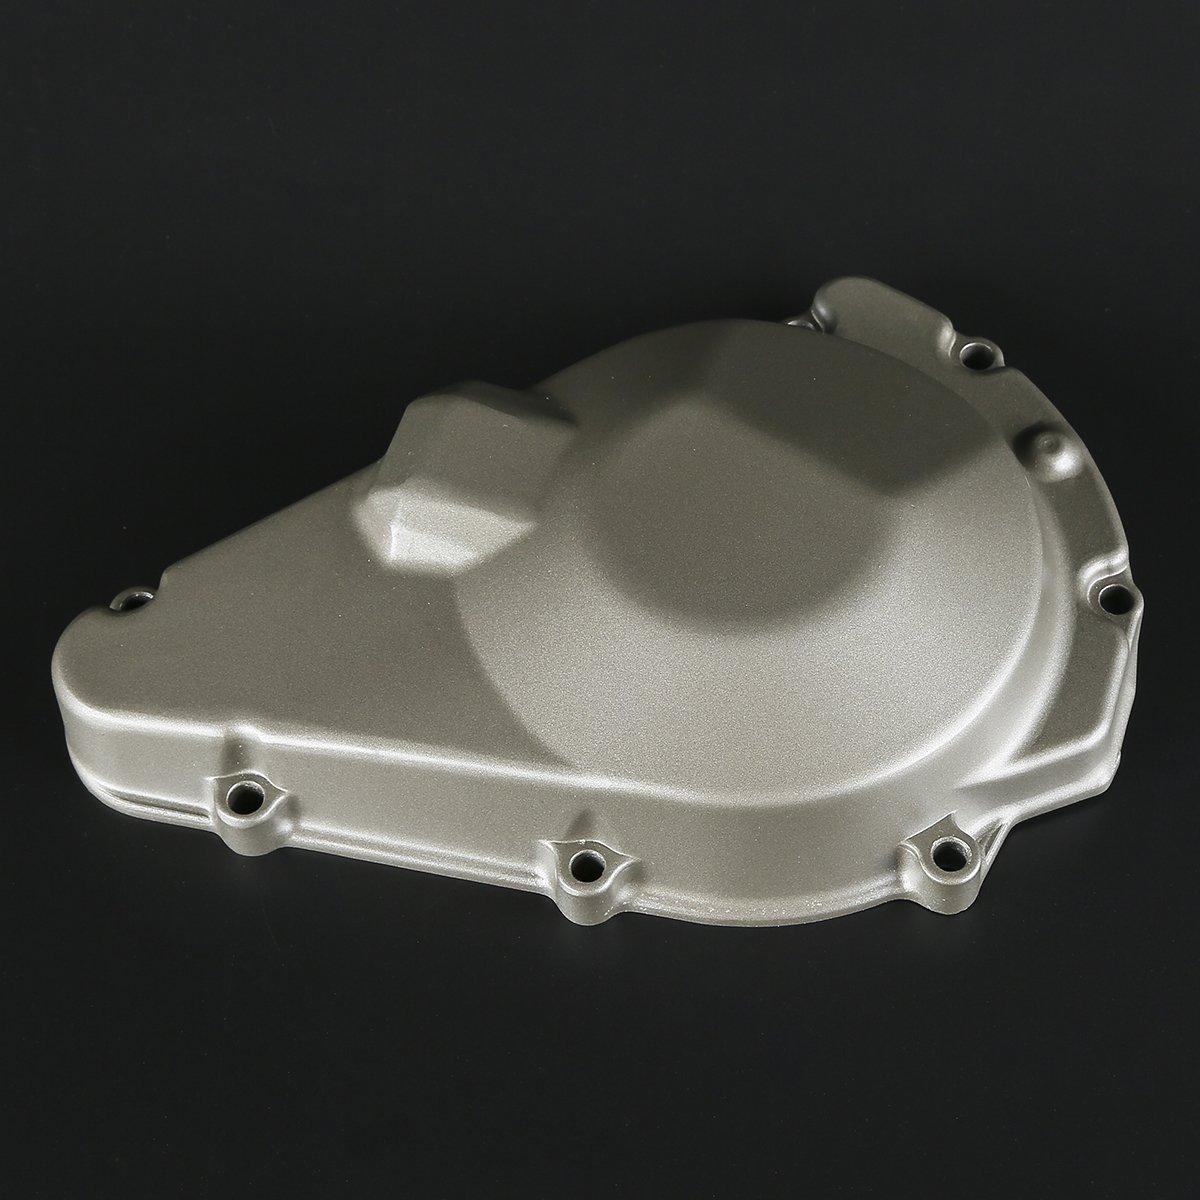 XMT-MOTO Aluminum Engine Stator Cover Crankcase For Suzuki GSX400 GK75A GK76A/GK78A RF400, GSF400 Bandit 400